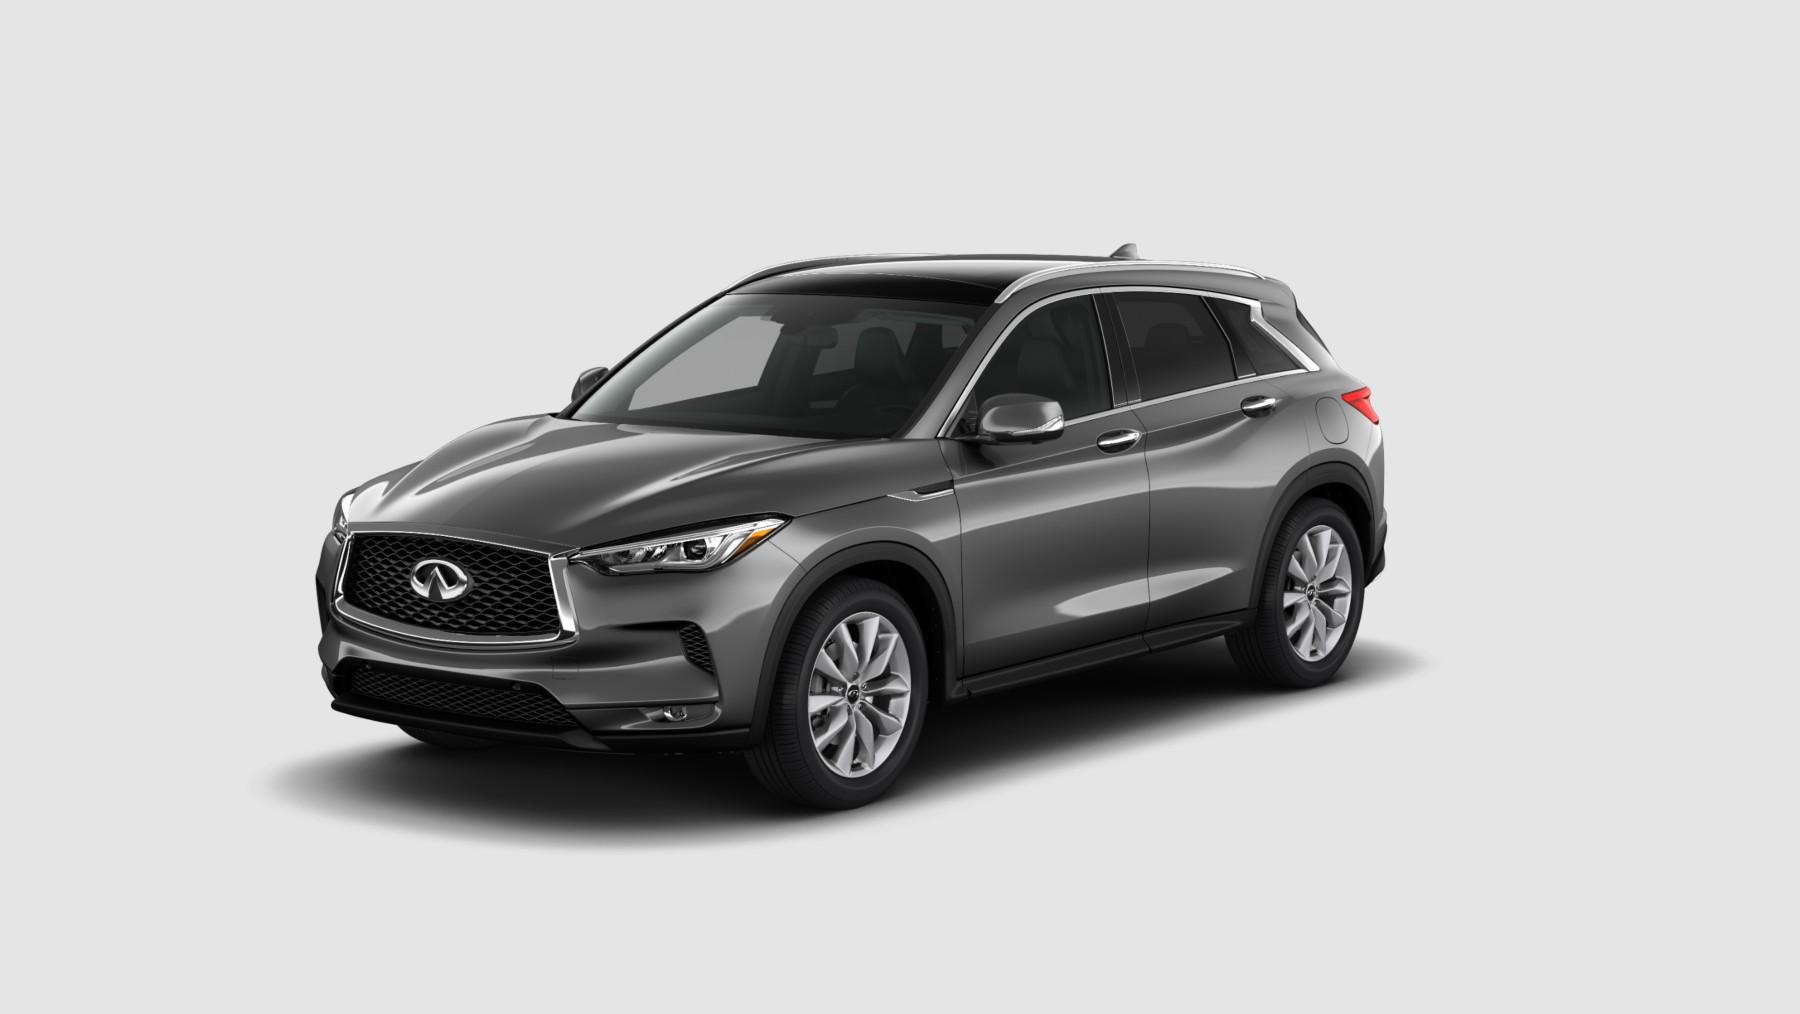 2019 INFINITI QX50 Vehicle Photo in San Antonio, TX 78230